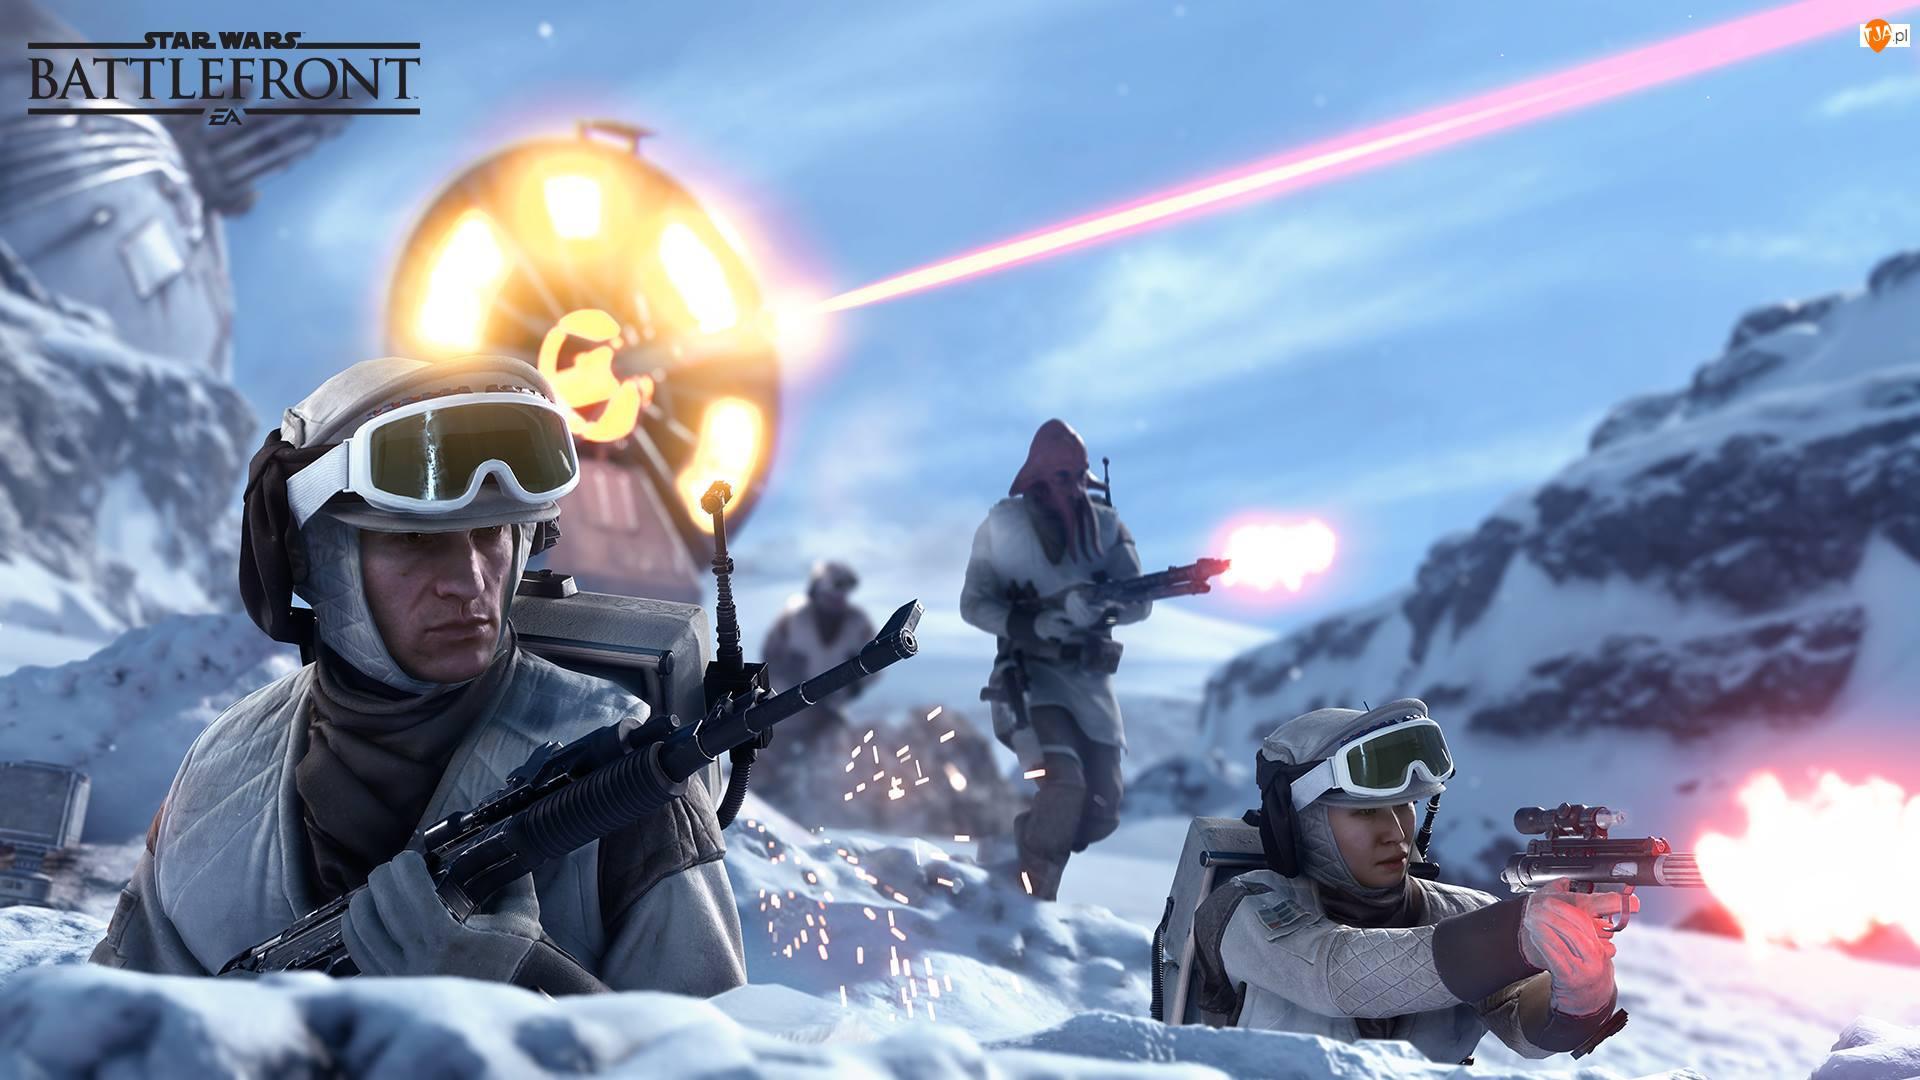 Planeta Hoth, Star Wars: Battlefront, Rebelianci